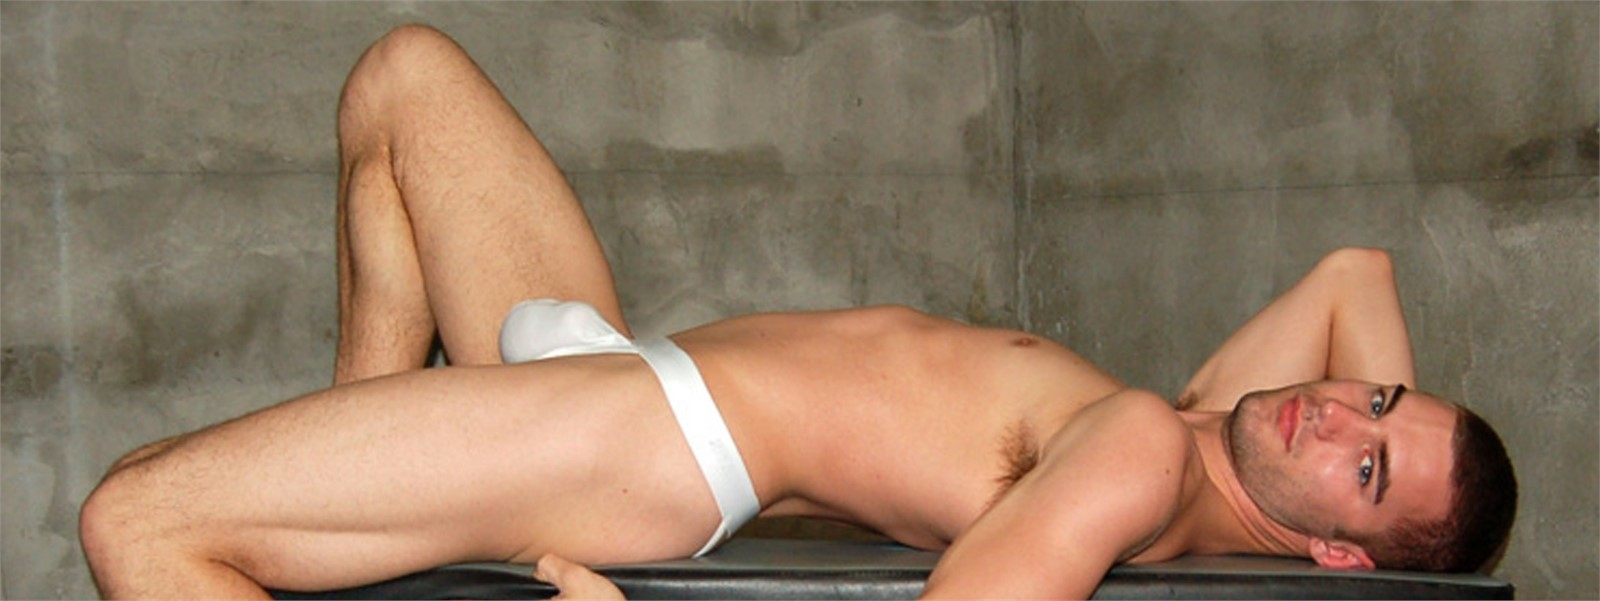 Amy Wild Actris Porno showing porn images for jackson sear porn | www.porndaa